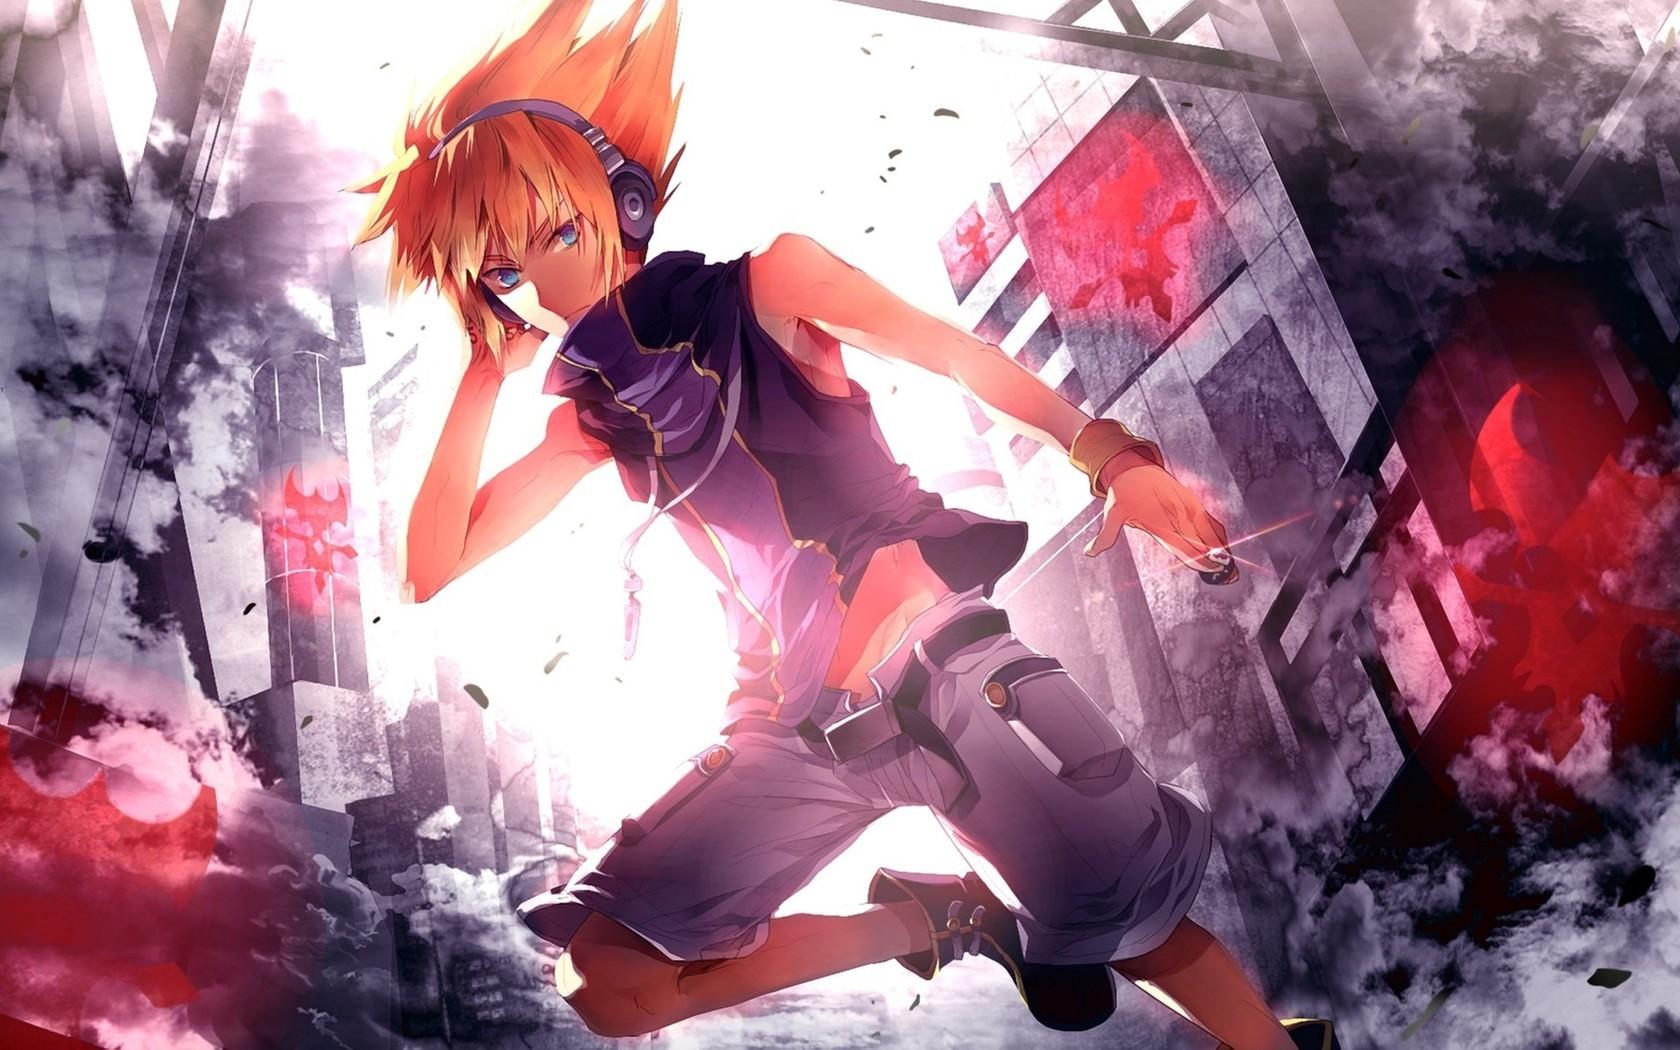 Wallpaper City Cityscape Anime Boys Headphones The World